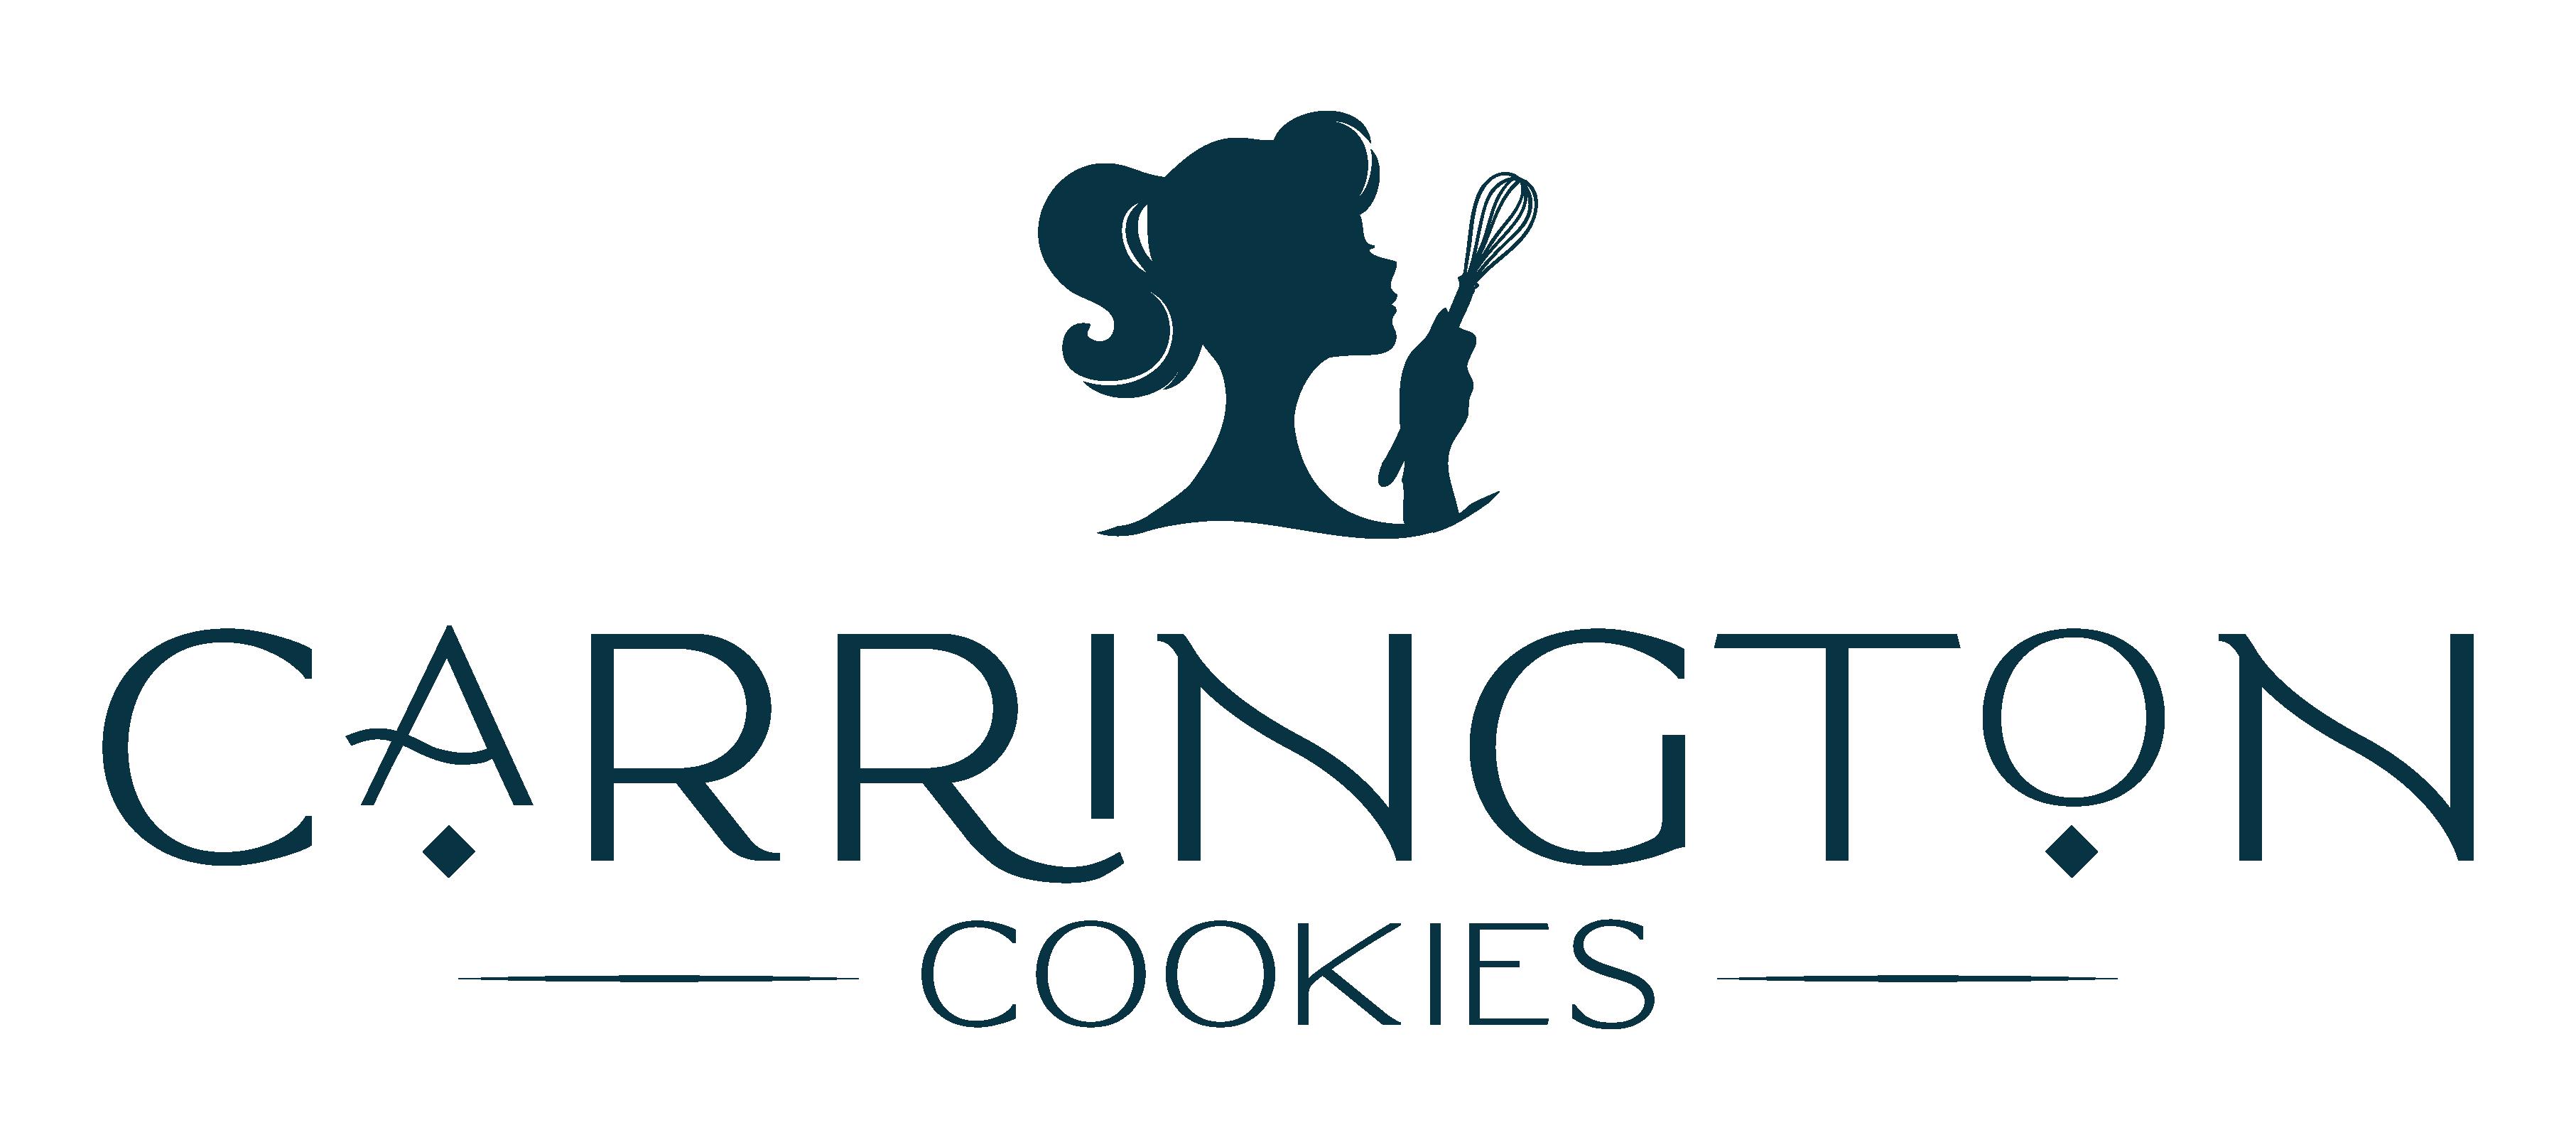 Carrington Cookies